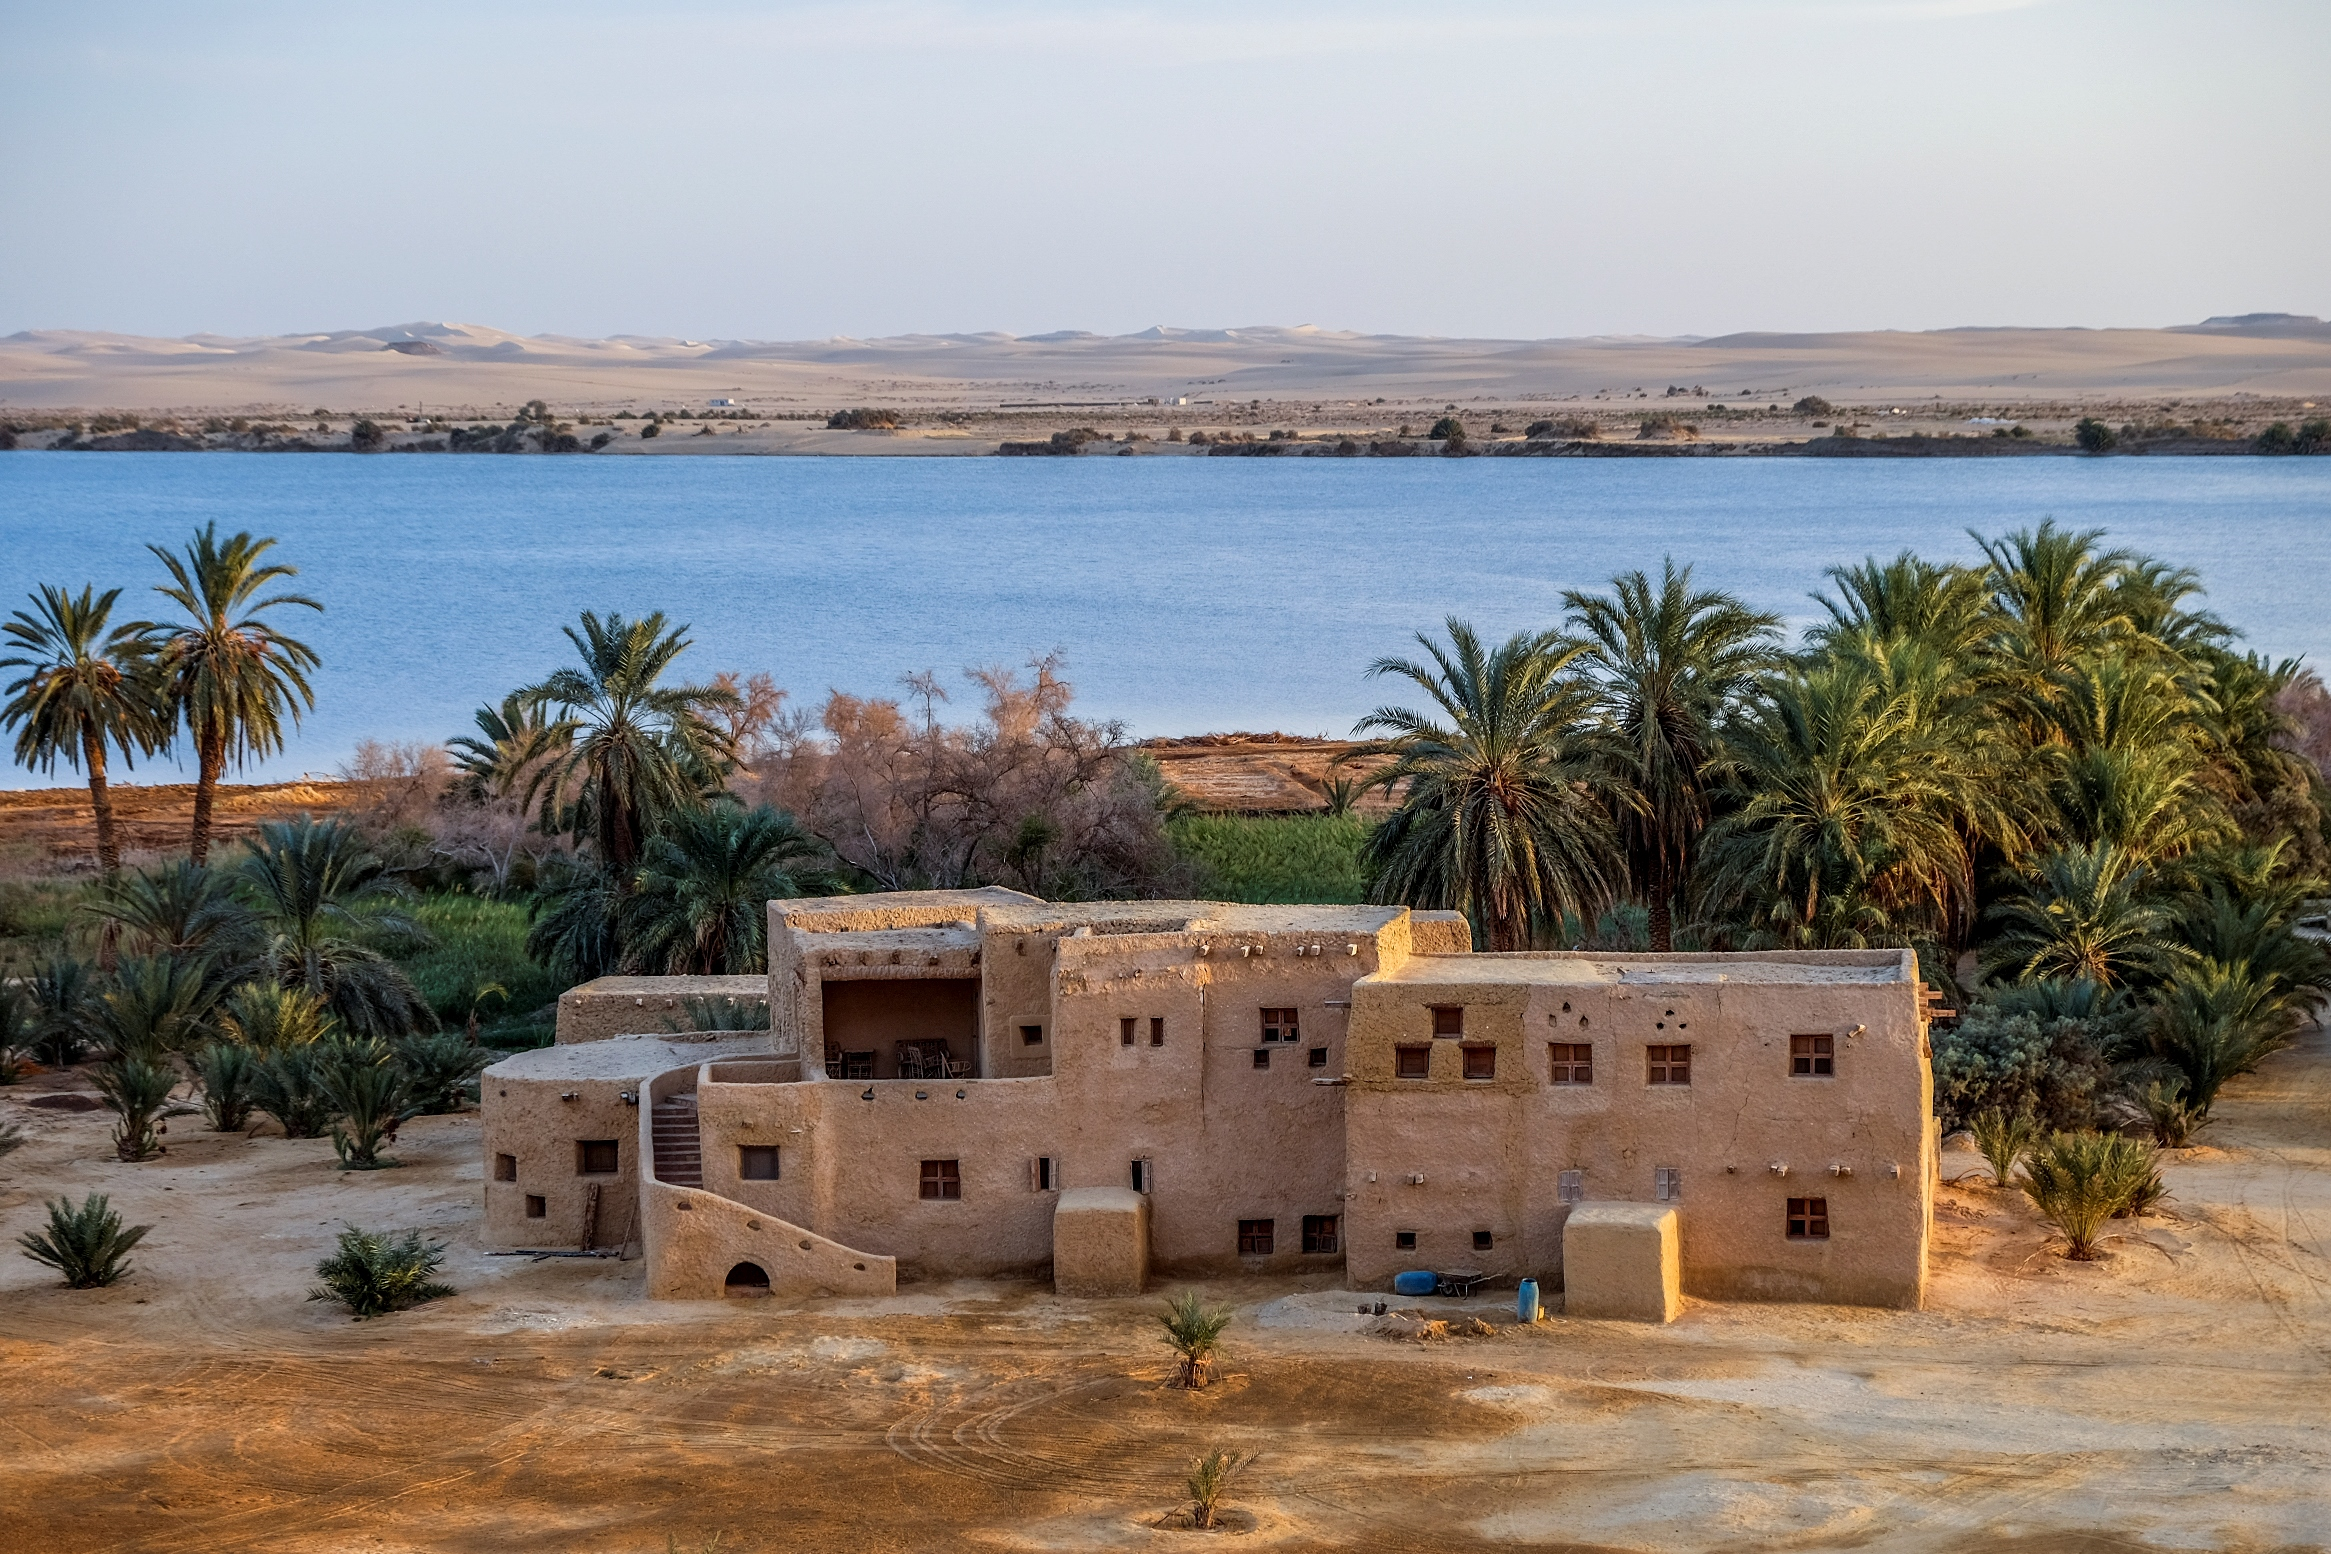 24 Wallpaper Hd 9 Ways To Enjoy Egypt S Siwa Oasis Egyptian Streets